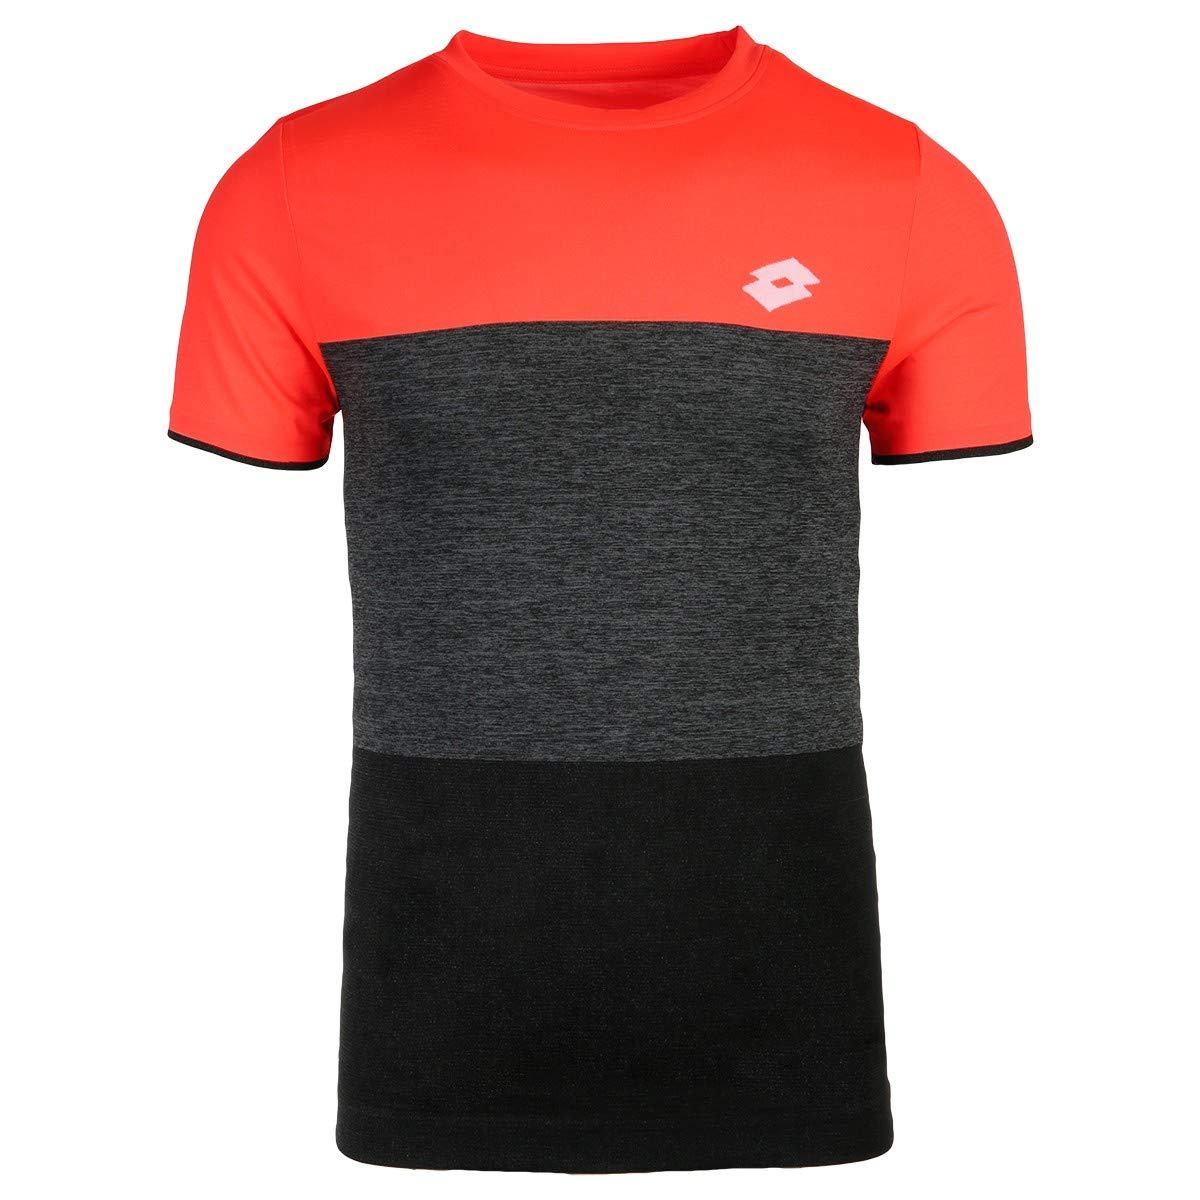 Lotto Camiseta Hombre pádel Tennis Tech tee. 210373 Coral/All ...